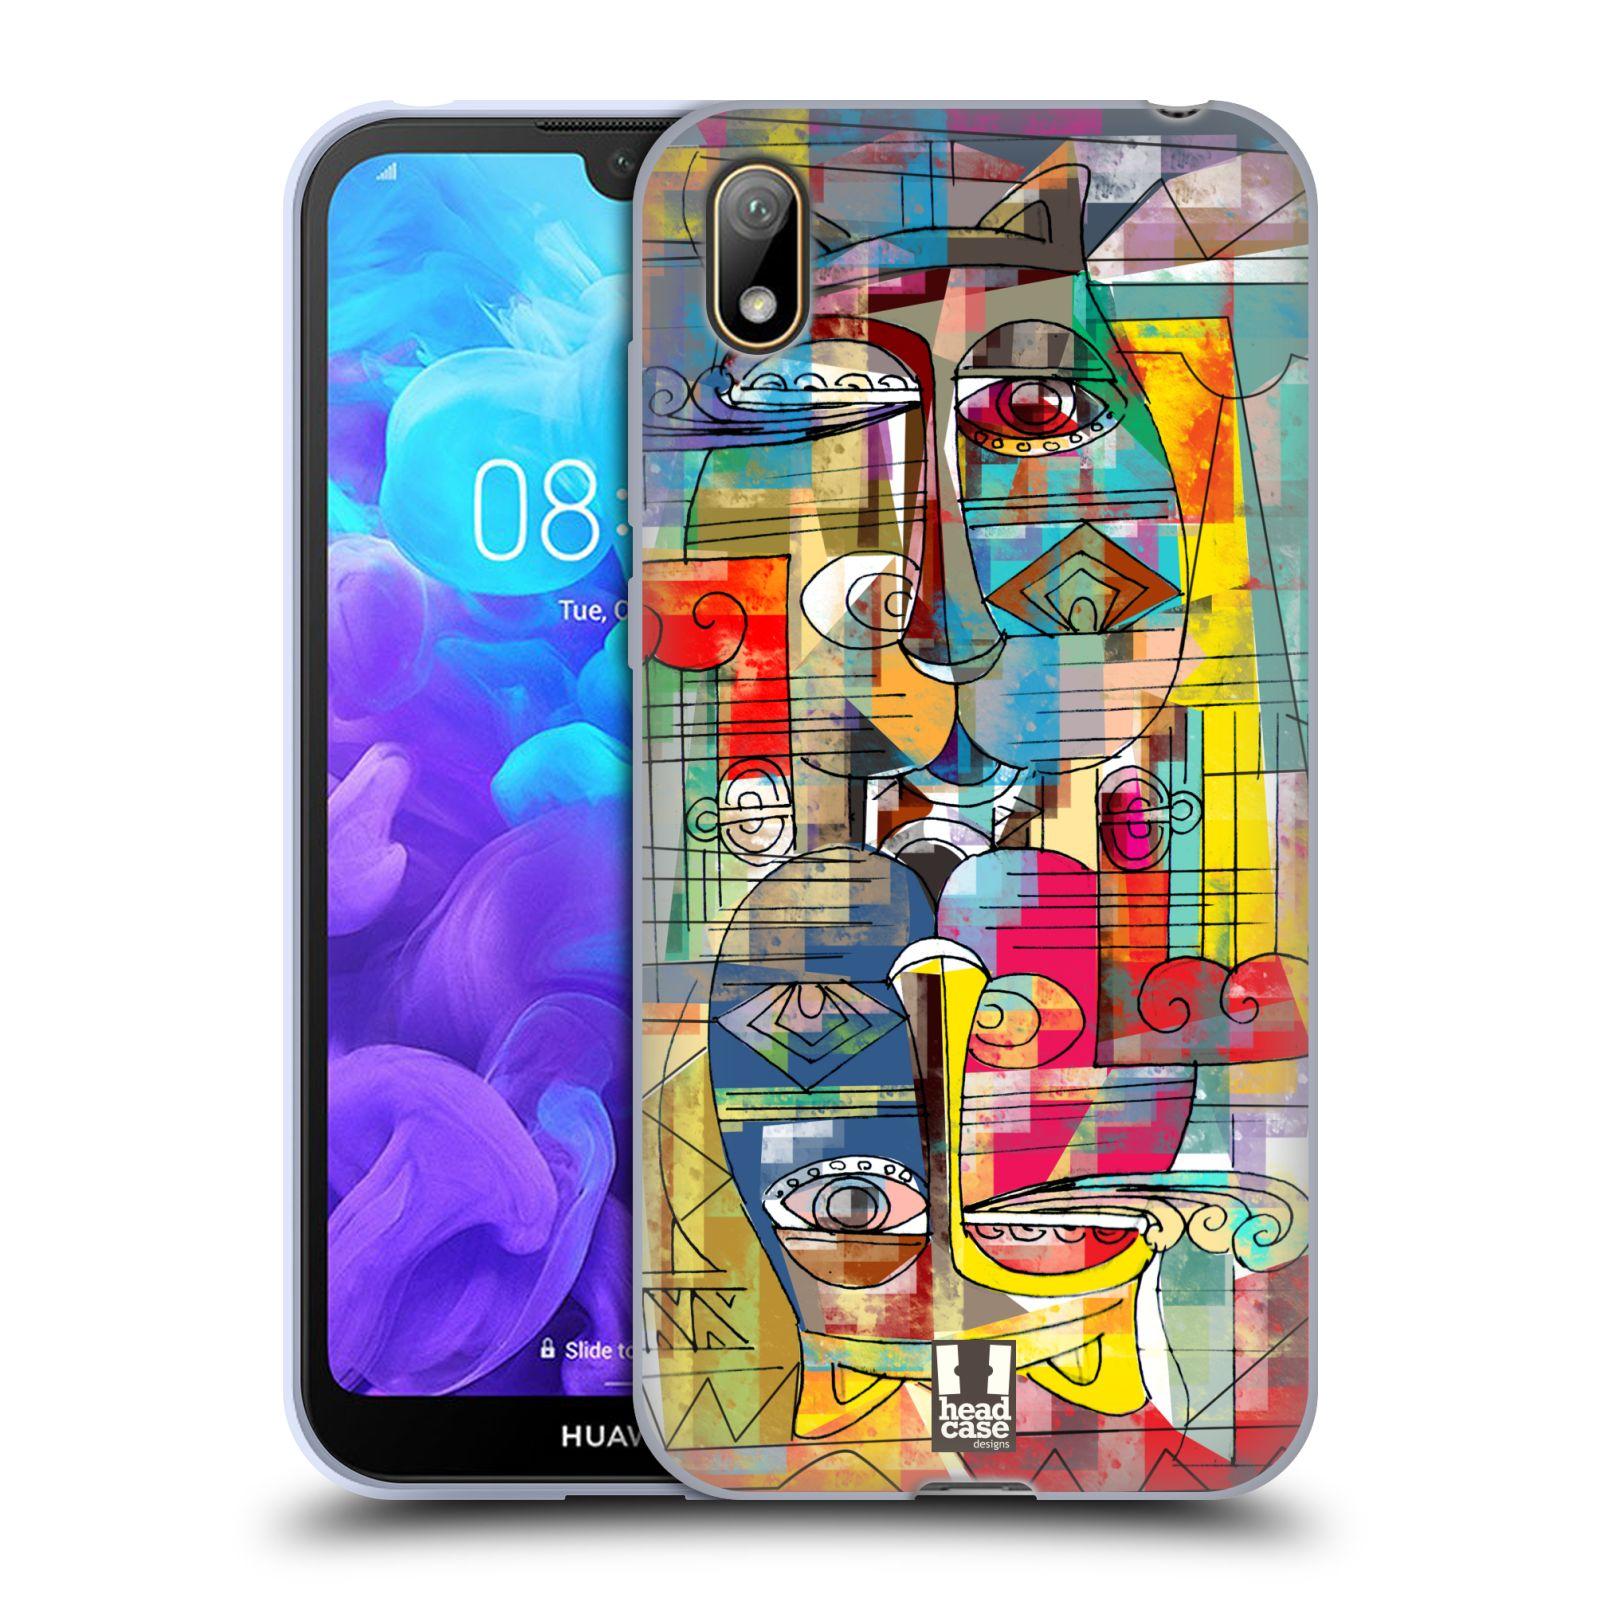 Silikonové pouzdro na mobil Huawei Y5 (2019) - Head Case - AZTEC MANX